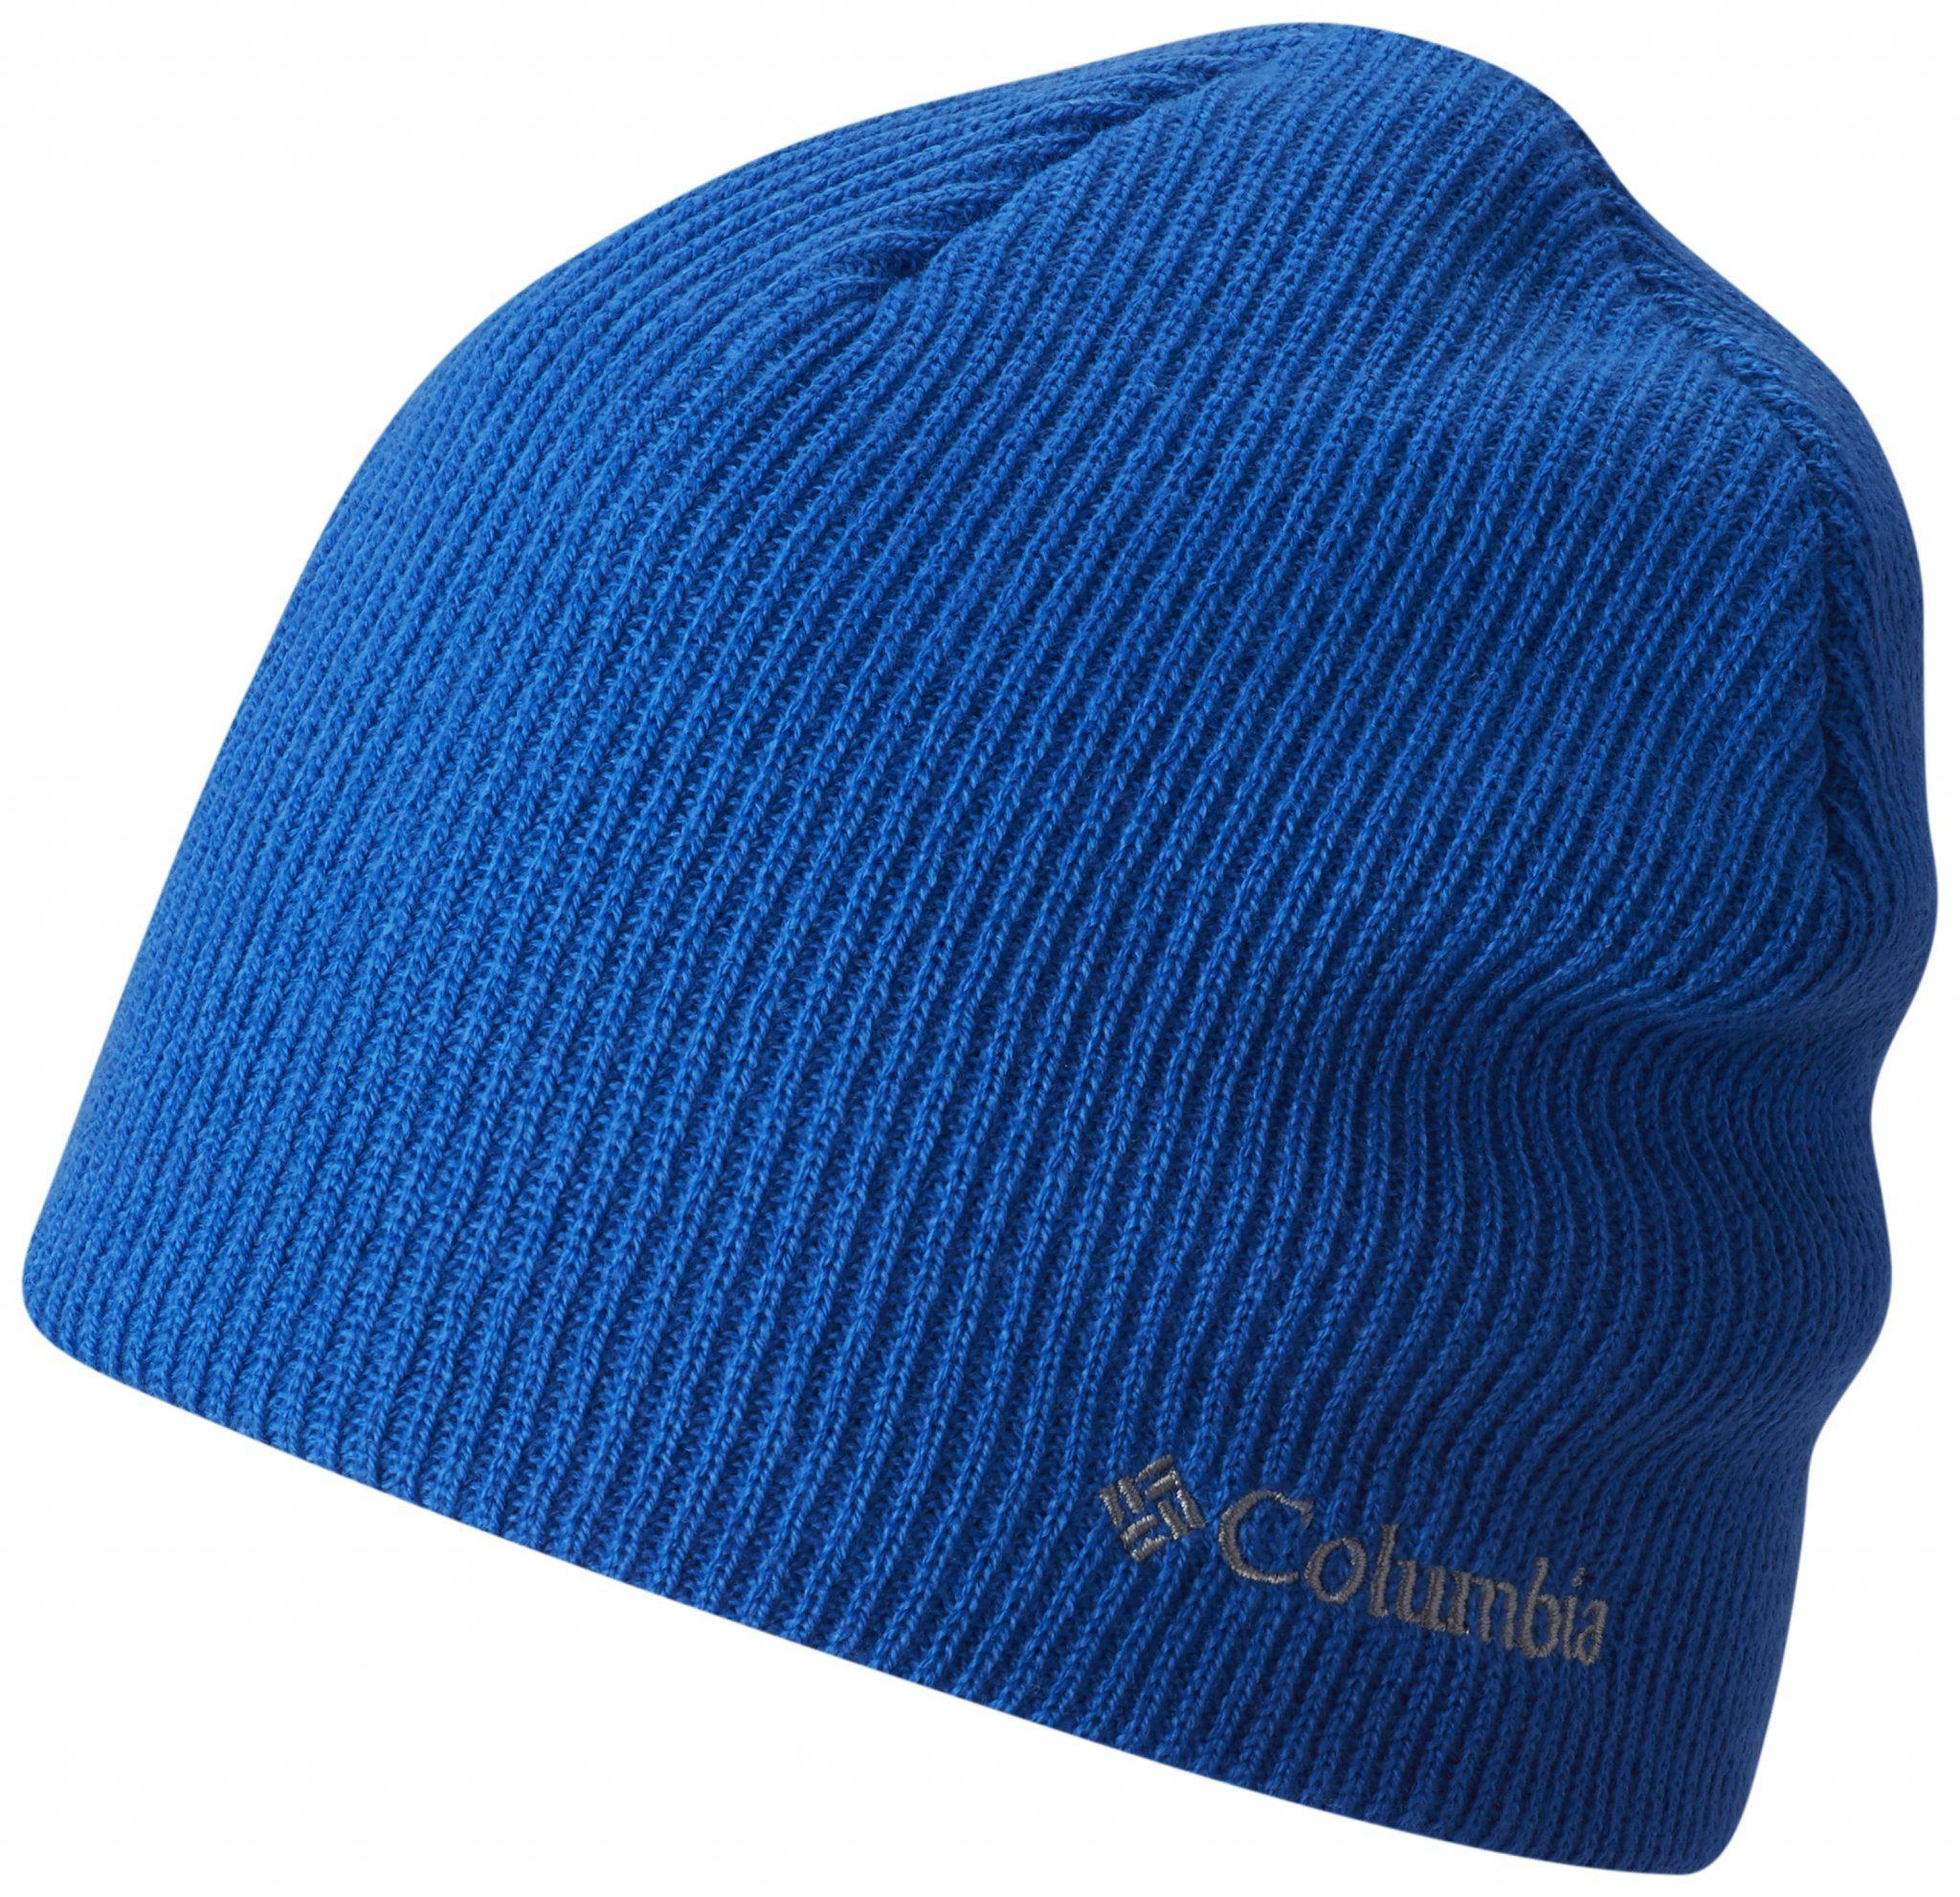 Columbia Mütze »Youth Whirlibird Watch Cap«